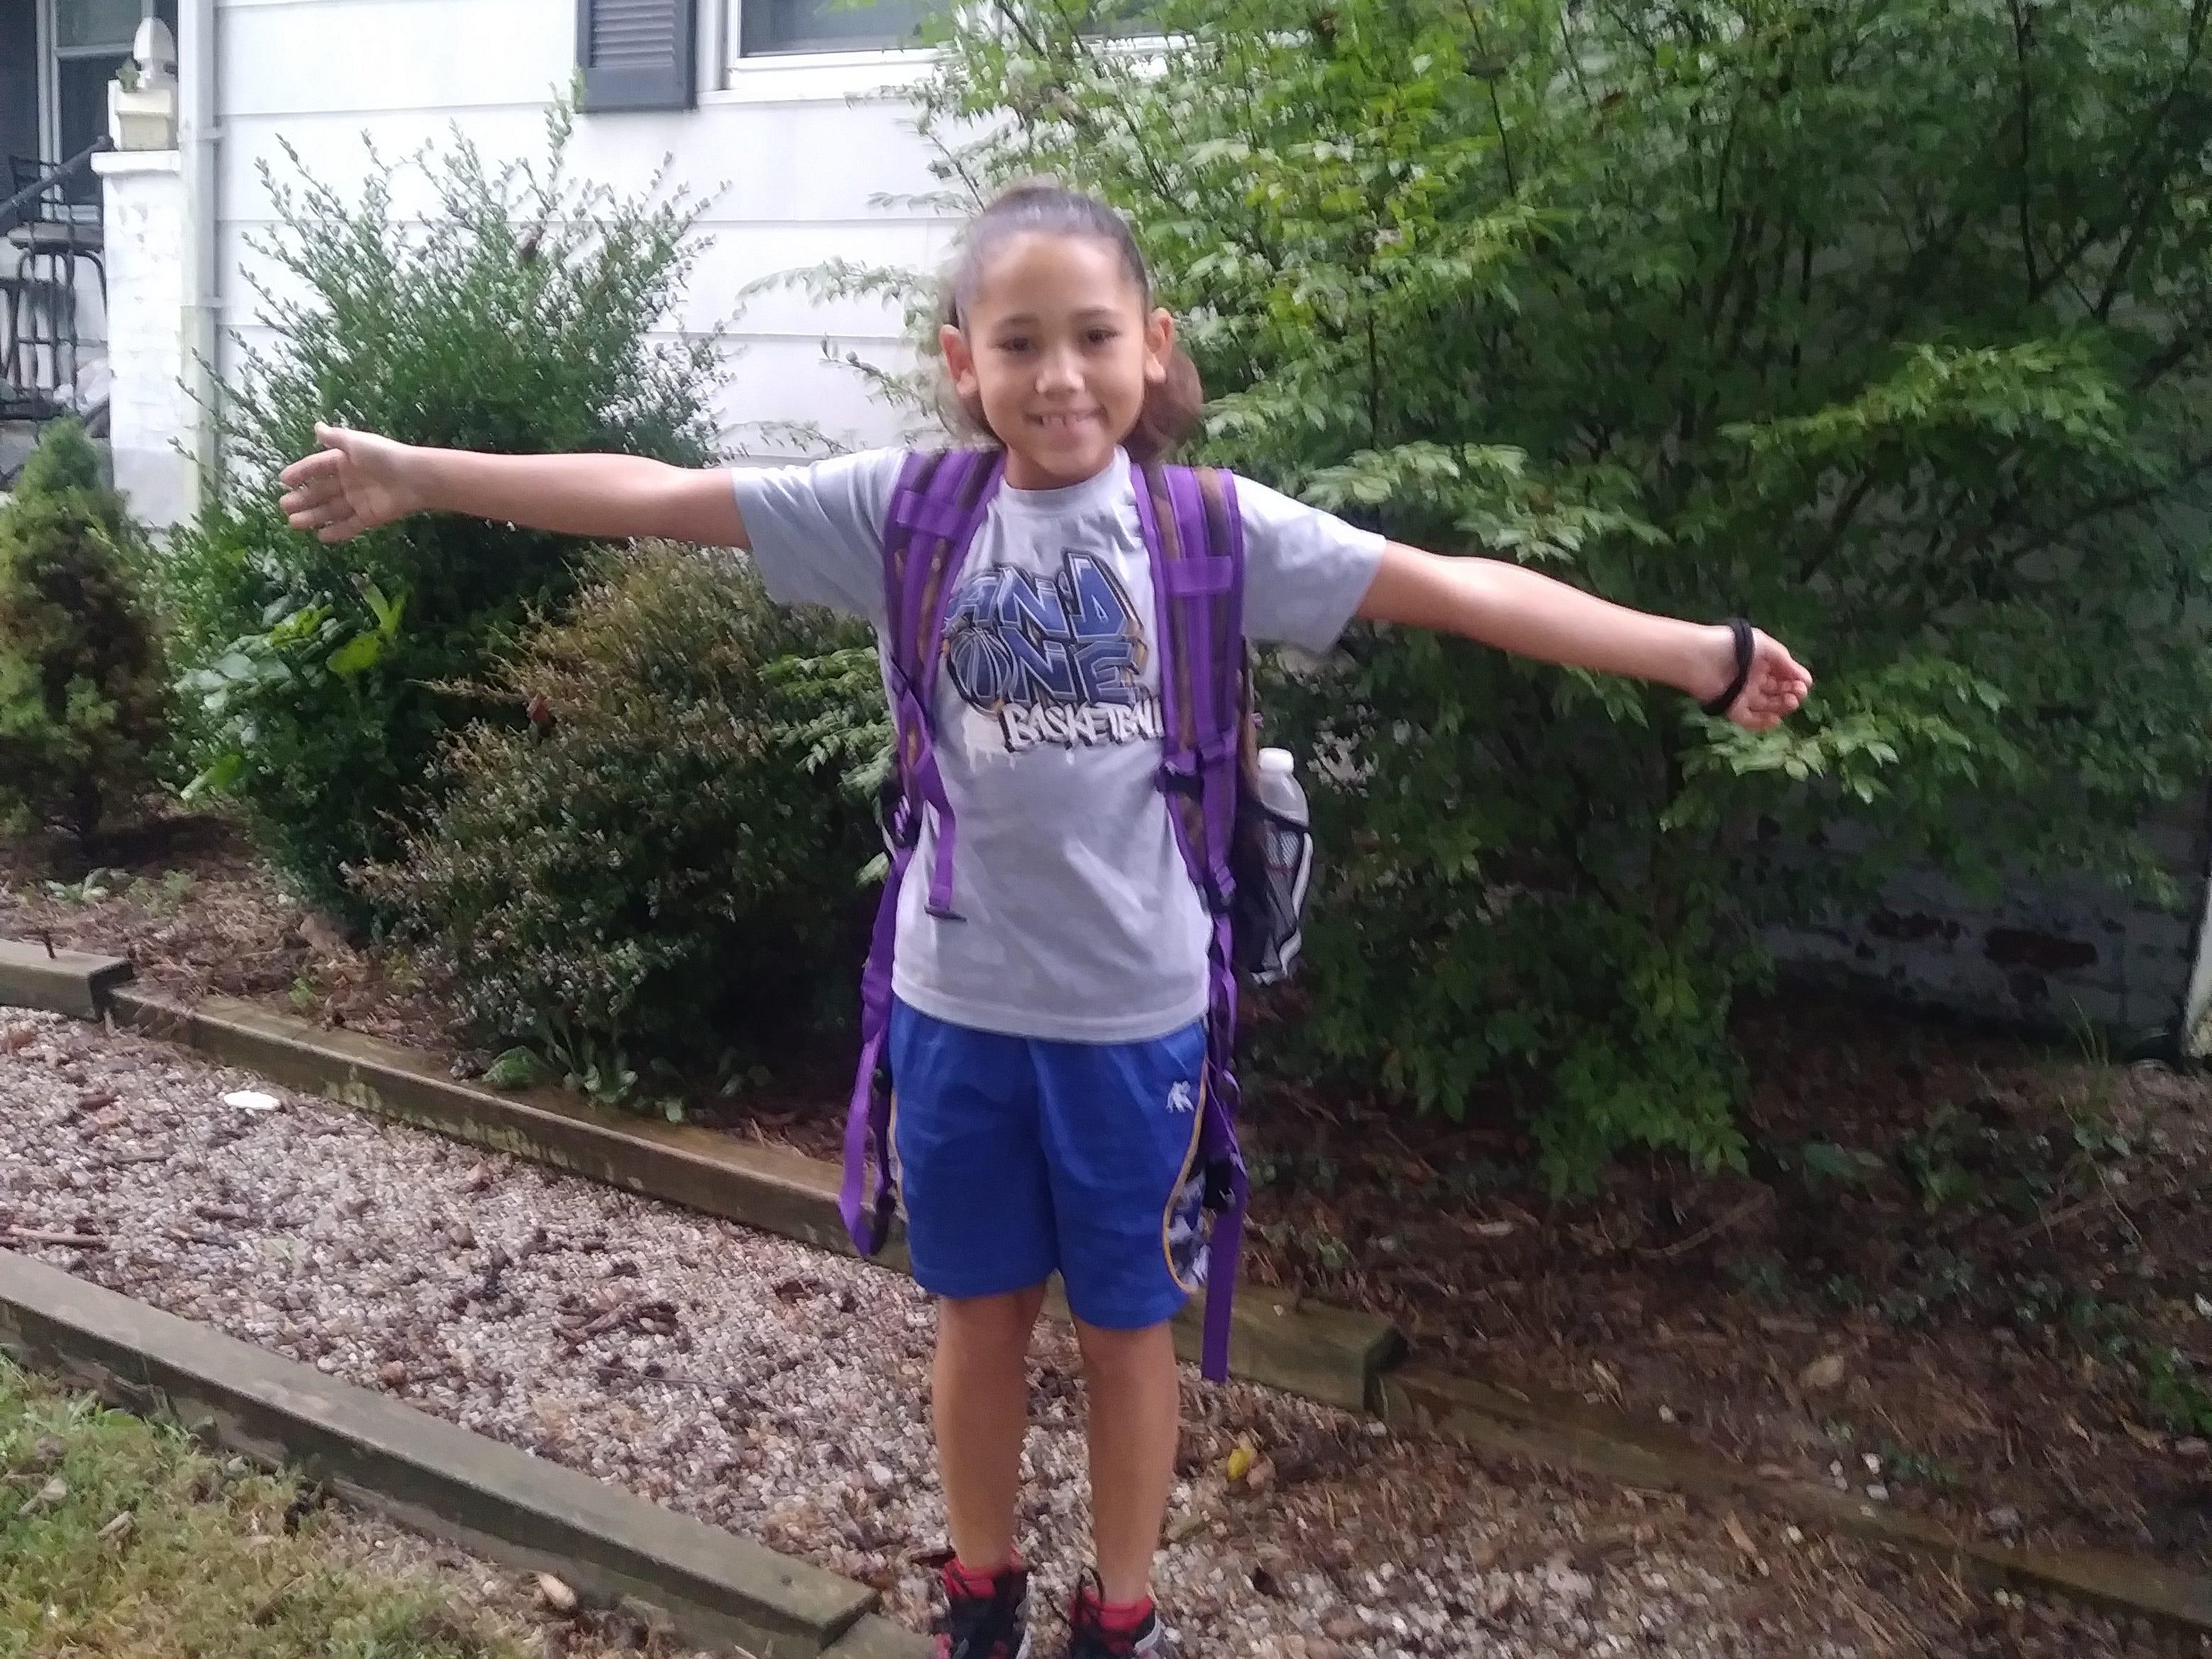 Jama Cabell 4th grade